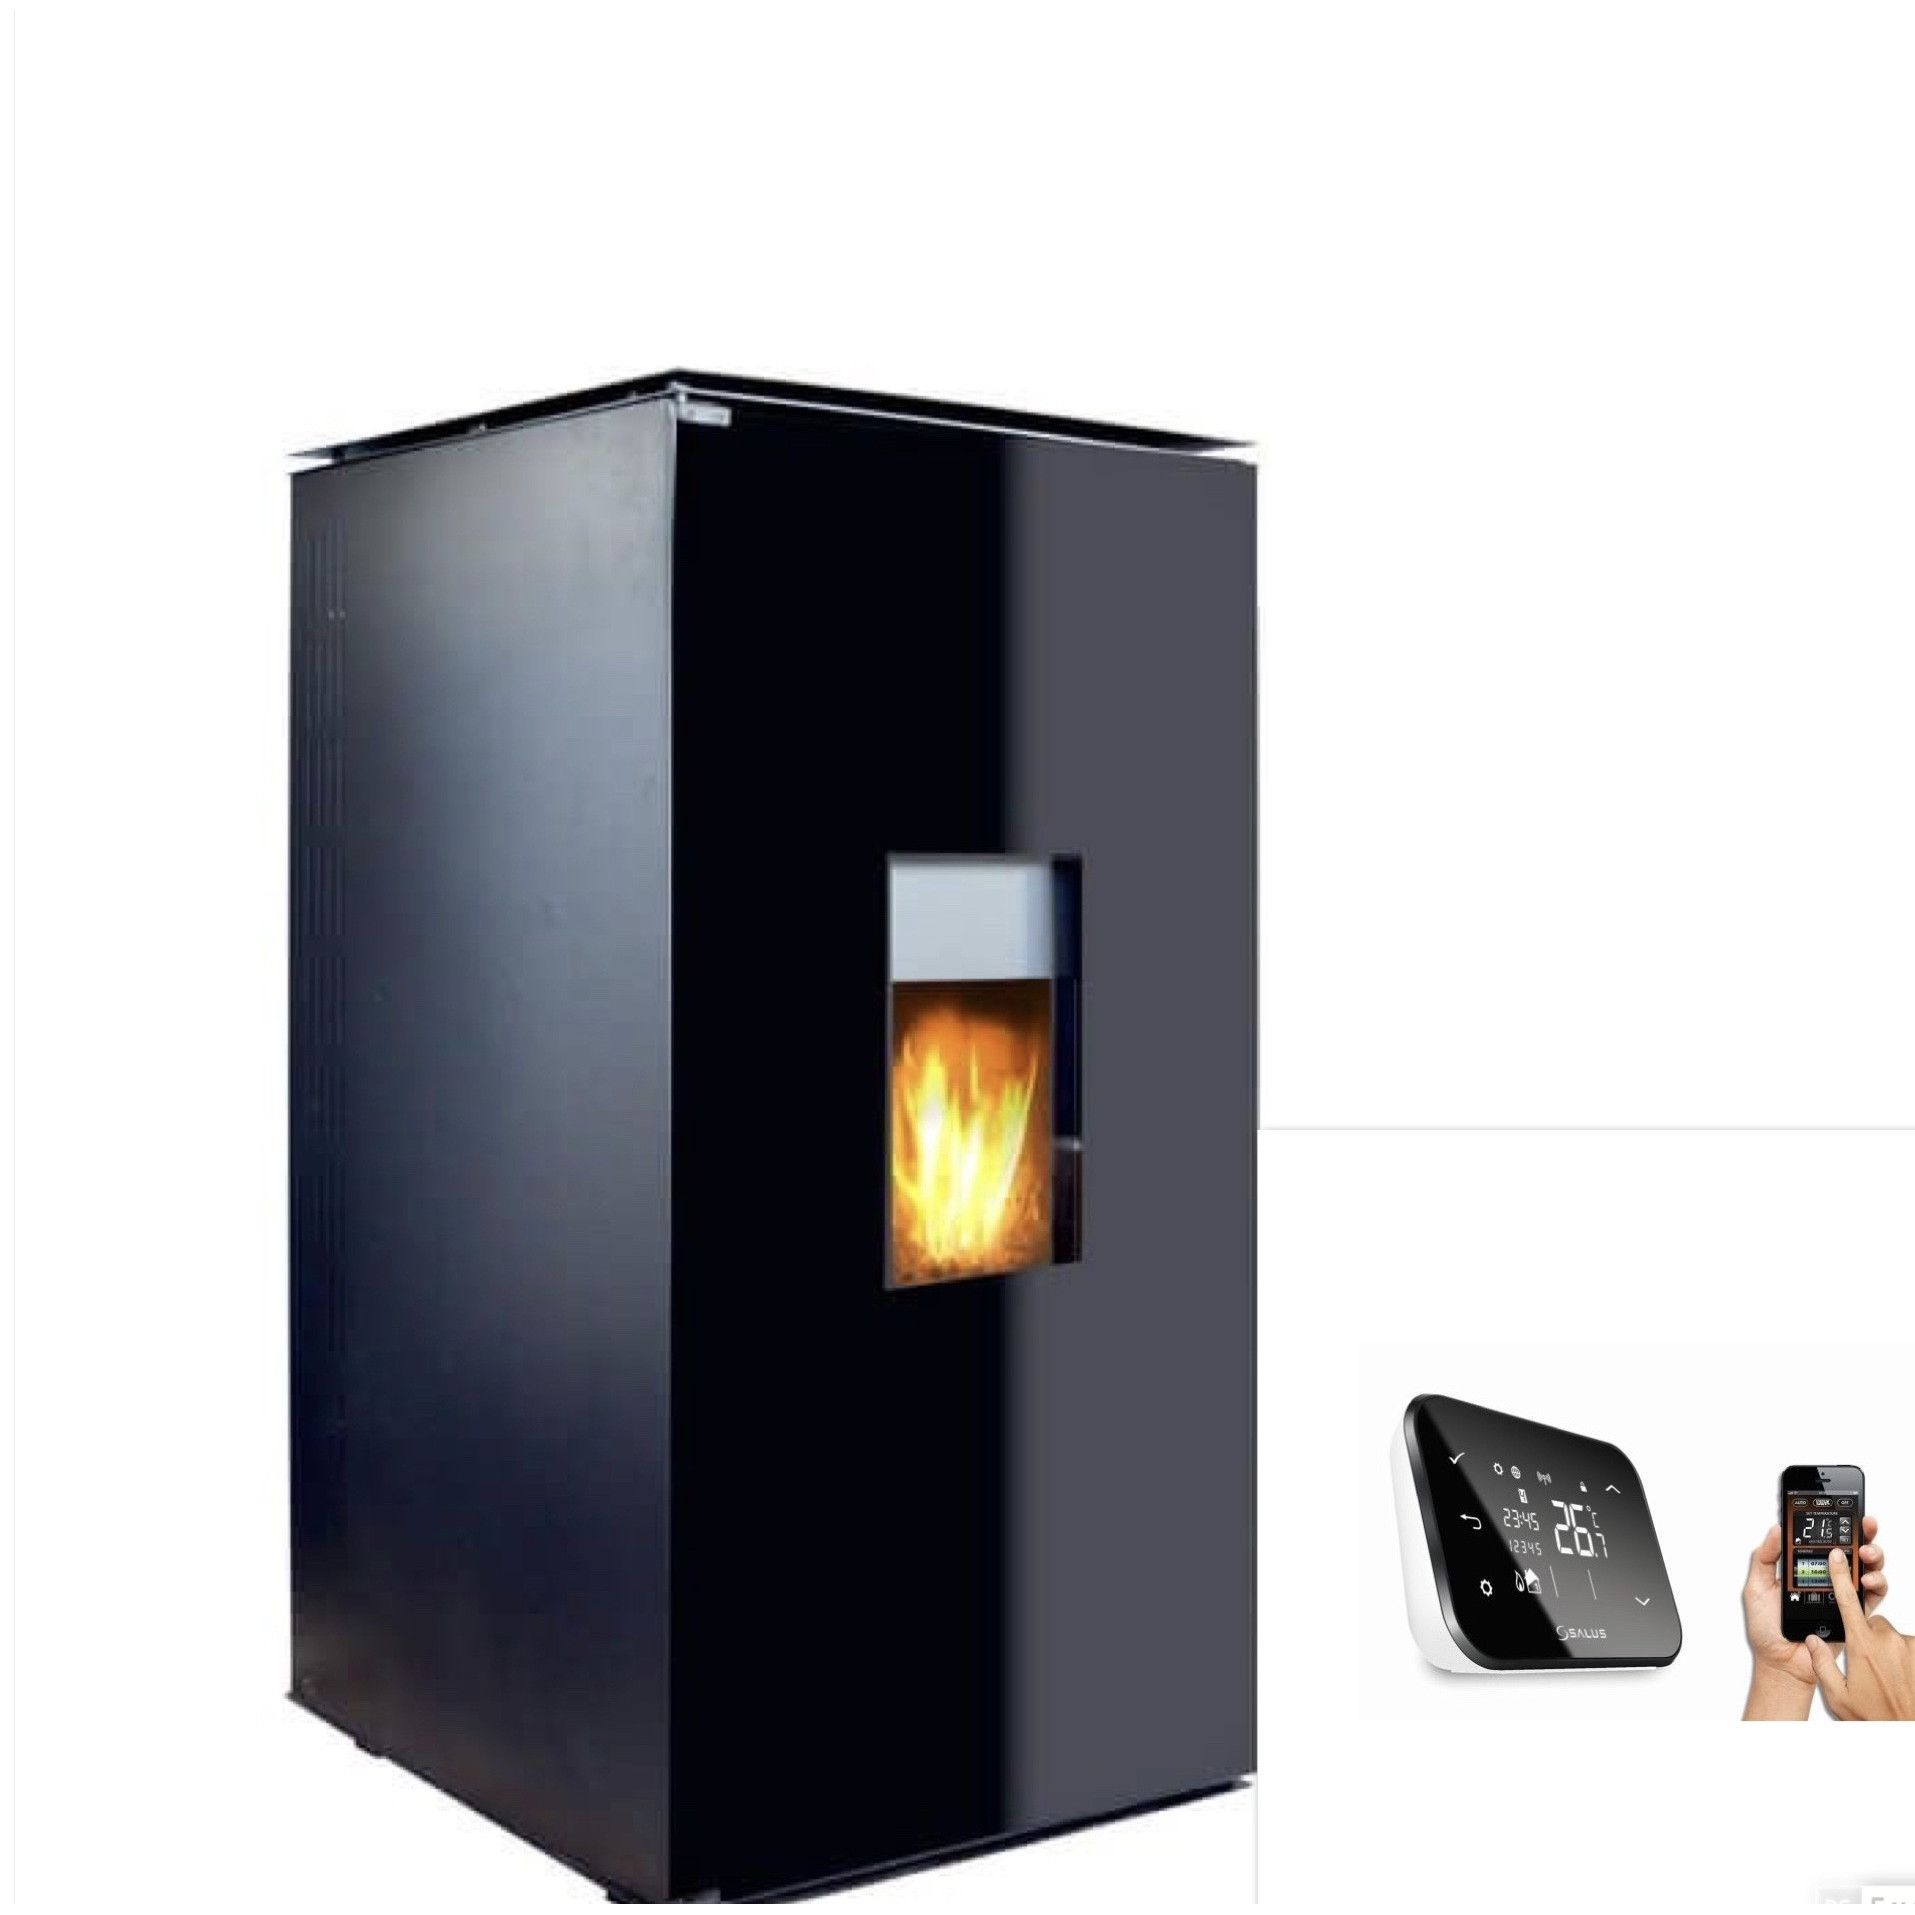 Termosemineu tip centrala termica pe peleti cu agent termic Fornello 25 kW Glass WI-FI cu control prin smartphone, echipat cu pompa, vas expansiune, supapa siguranta, telecomanda imagine fornello.ro